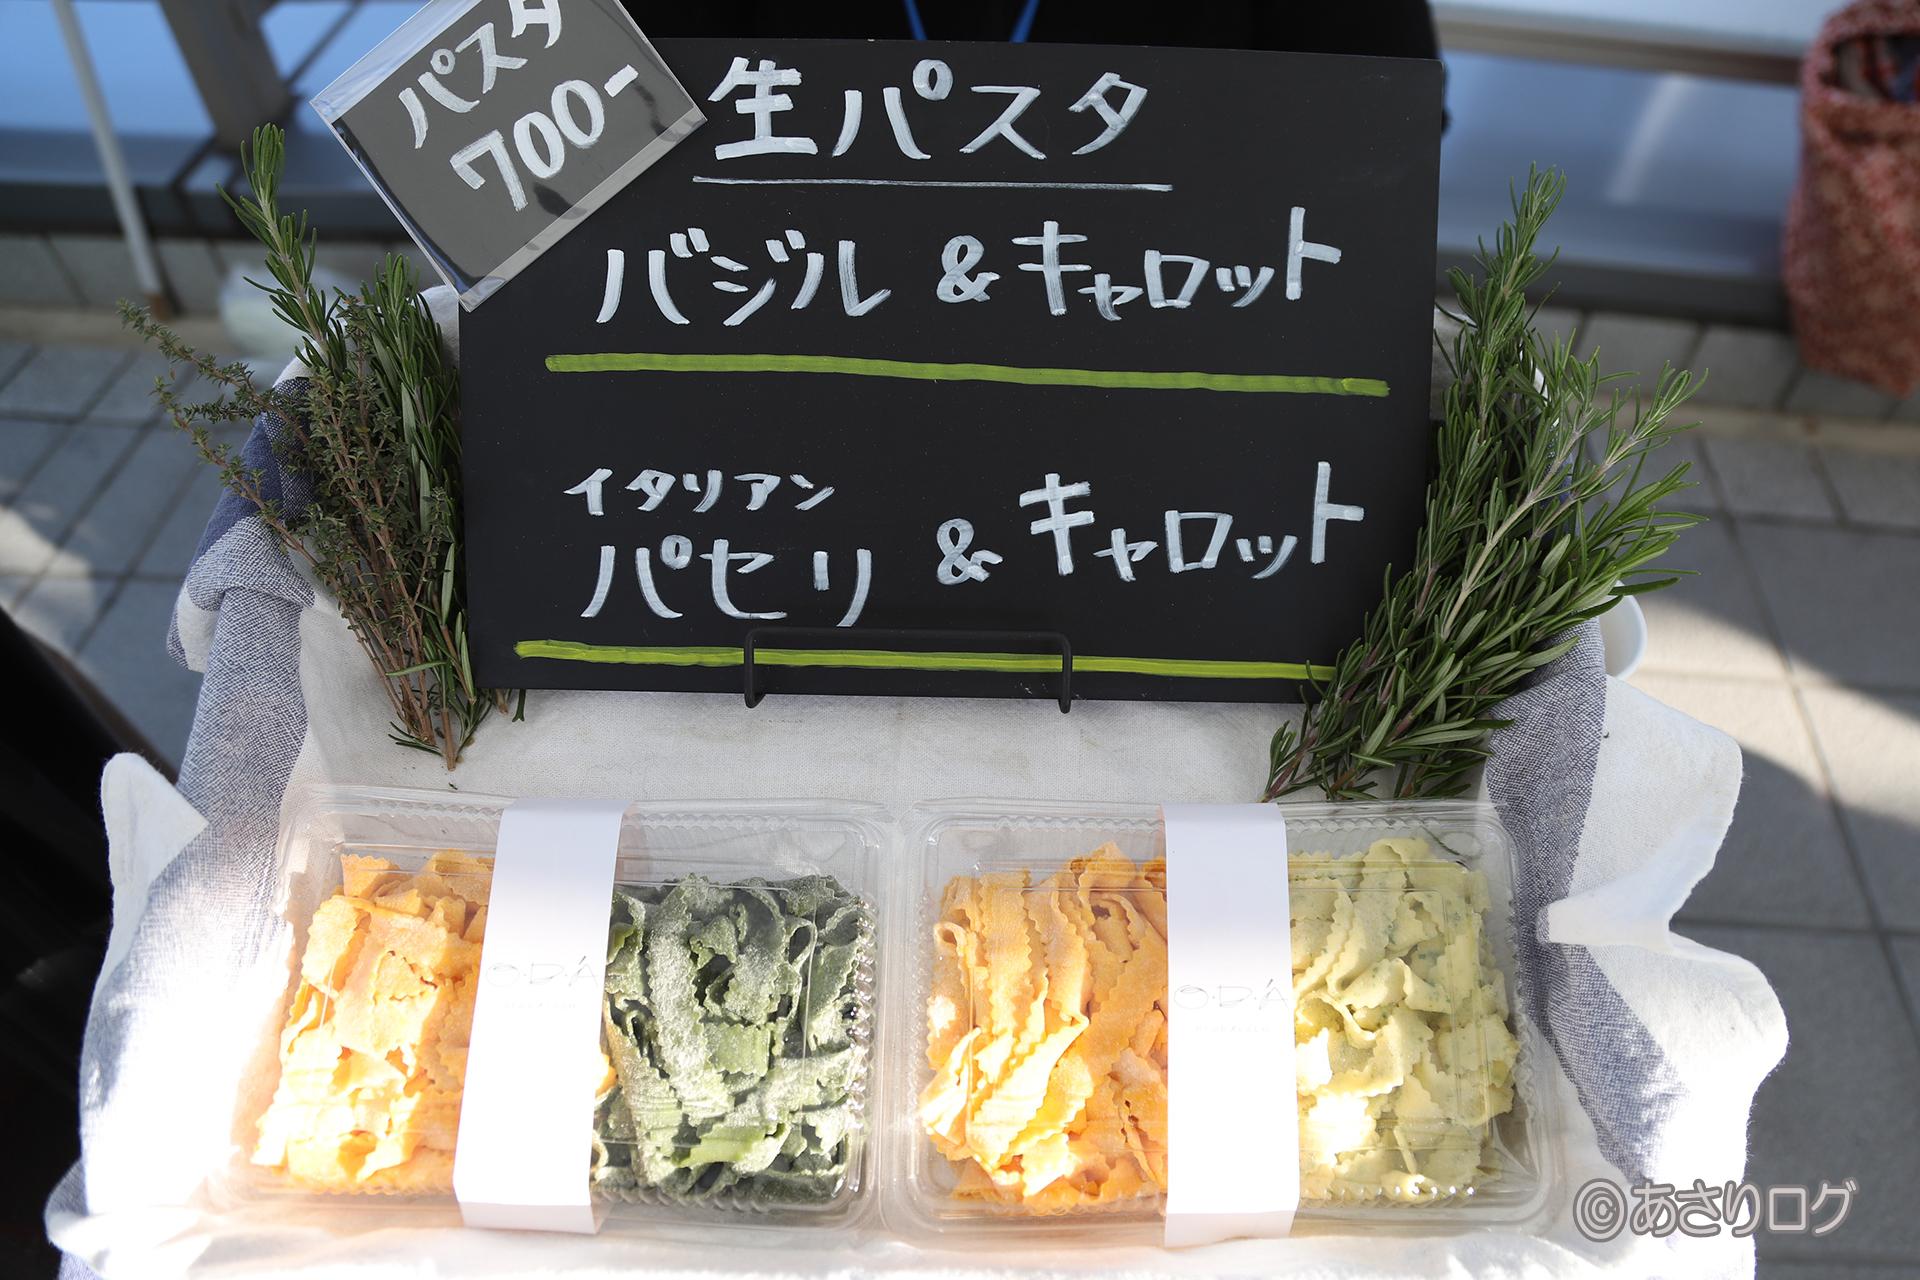 kofu Herbs